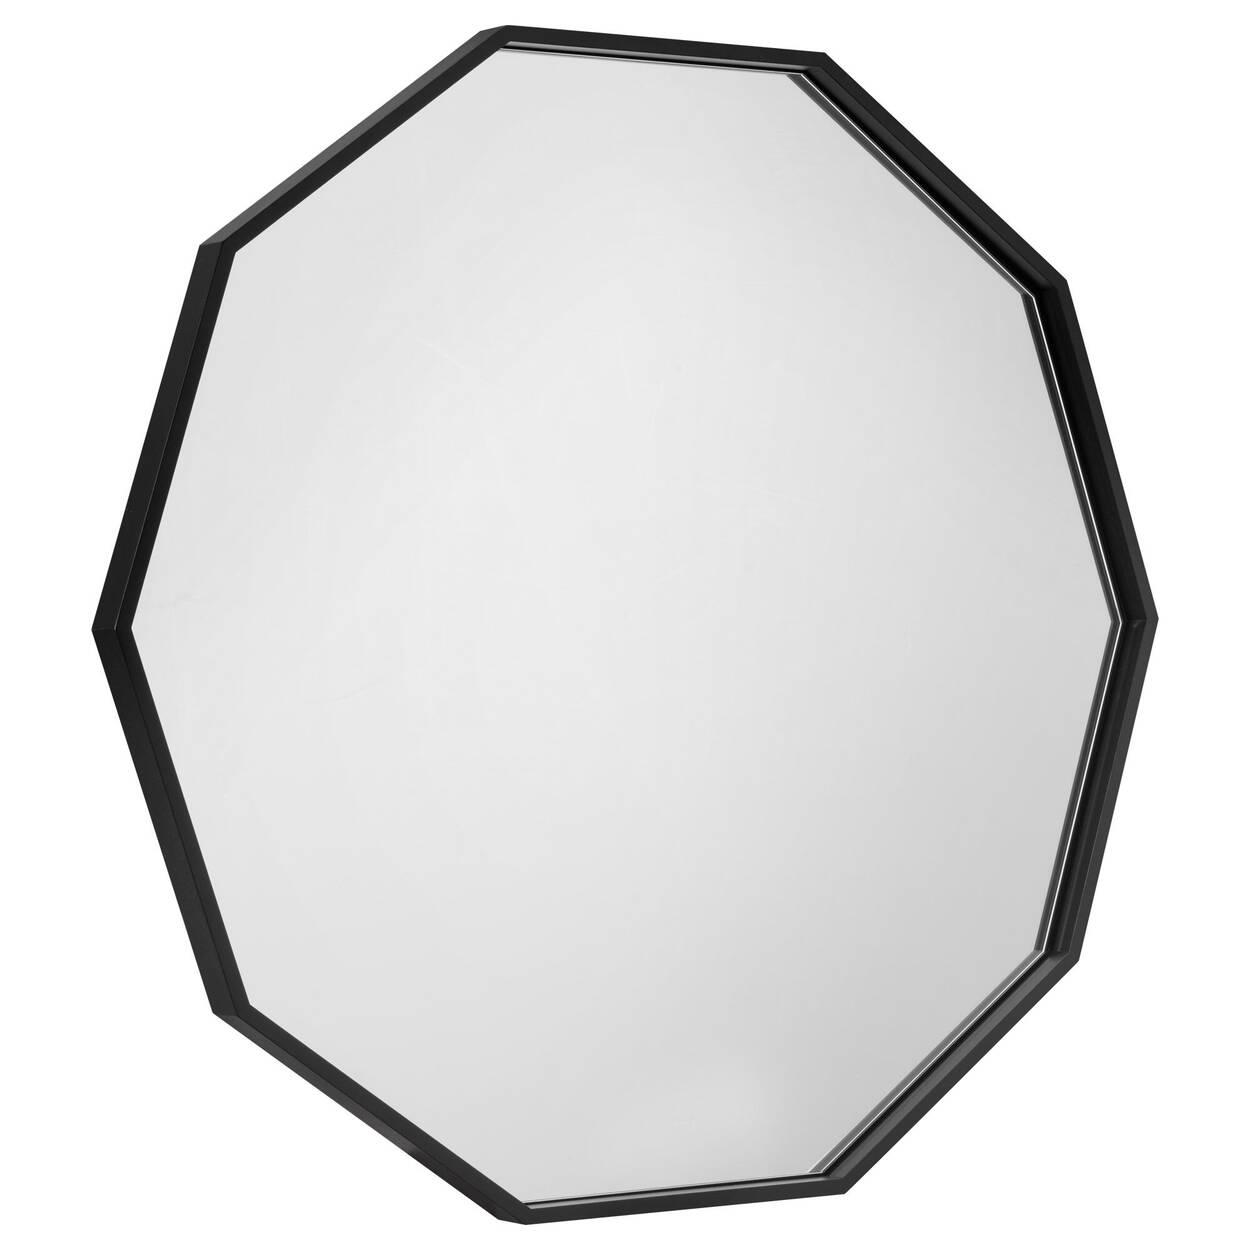 Miroir polygone avec cadre